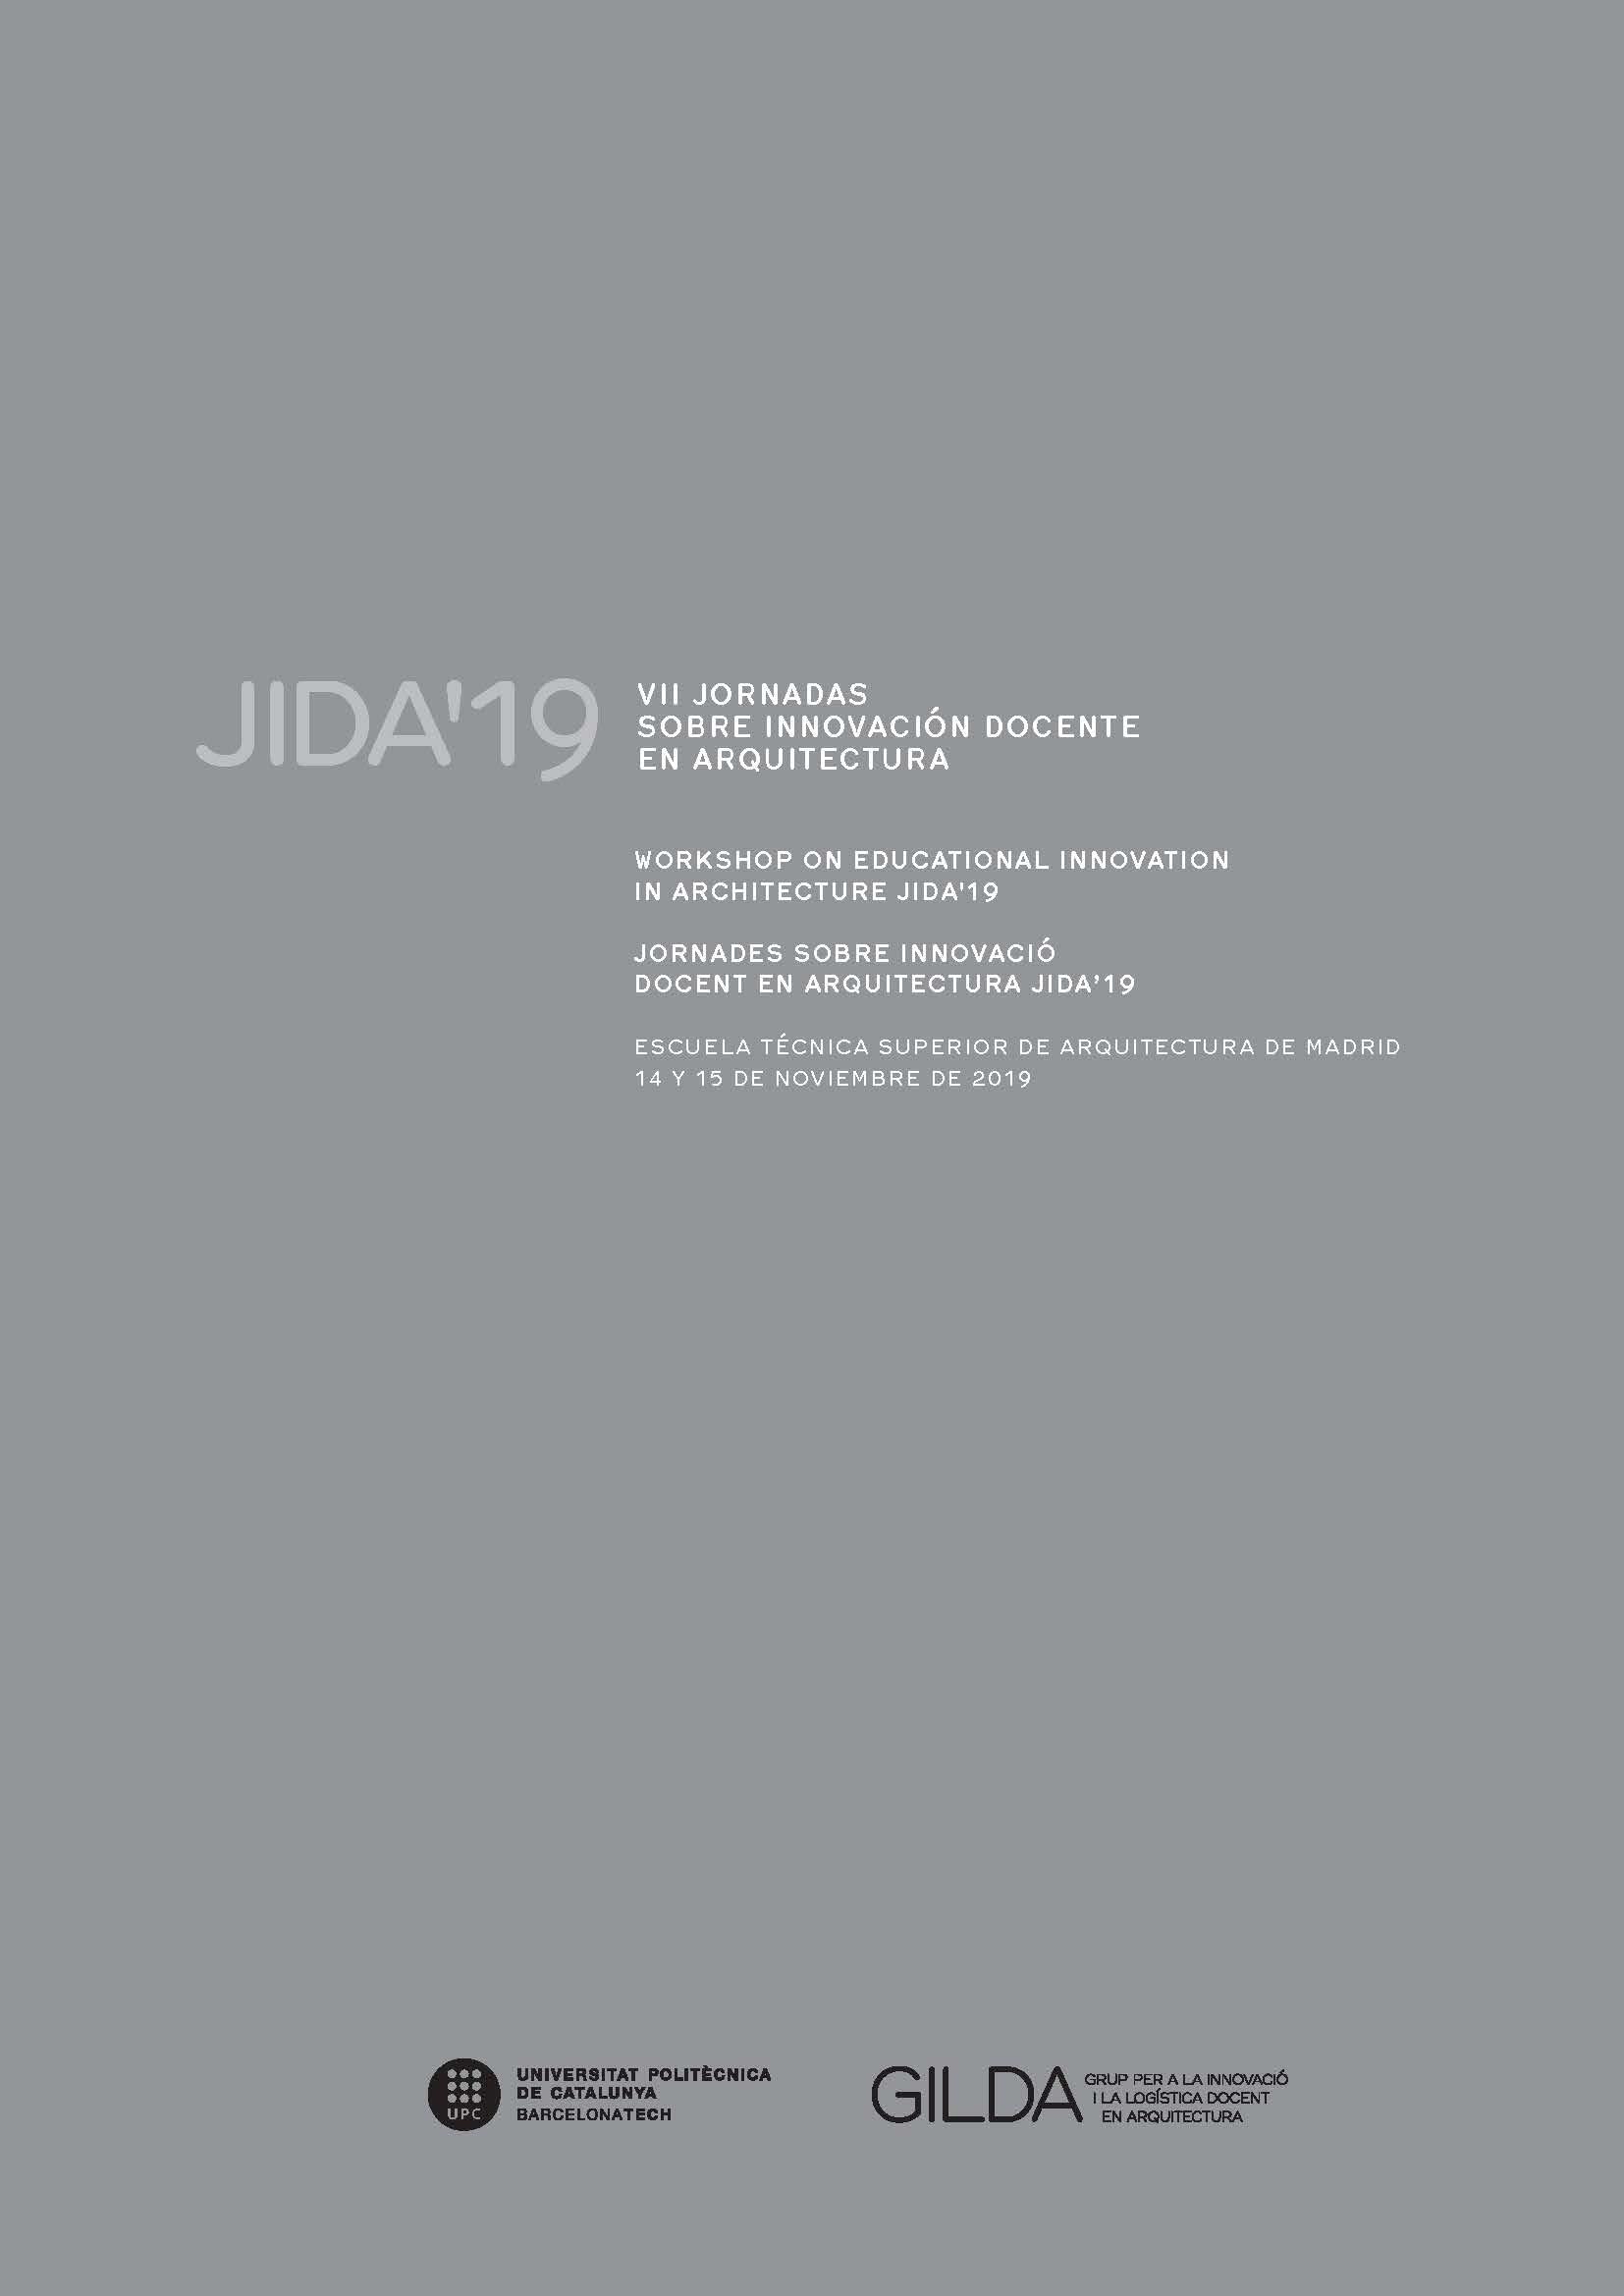 Ver JIDA'19